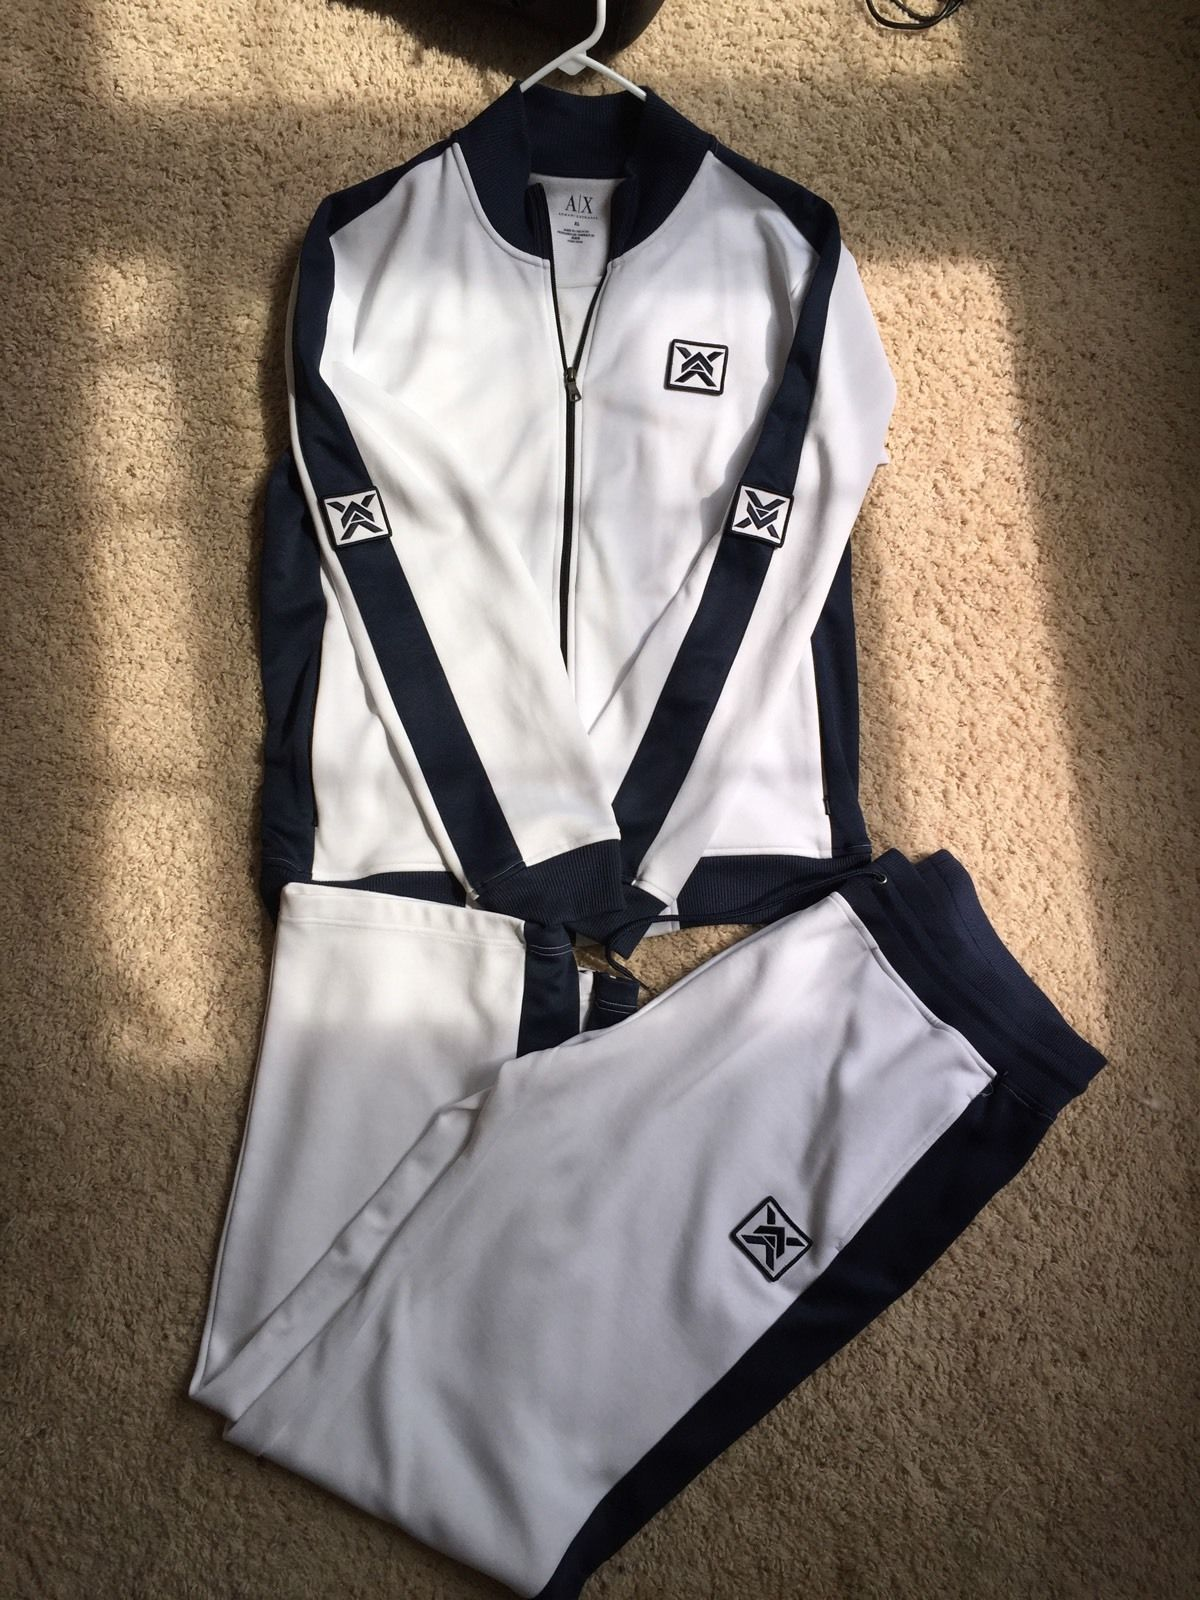 b7eacf746 Mens Armani Exchange Sweatsuit Track Suit | eBay | Comedy of Errors ...